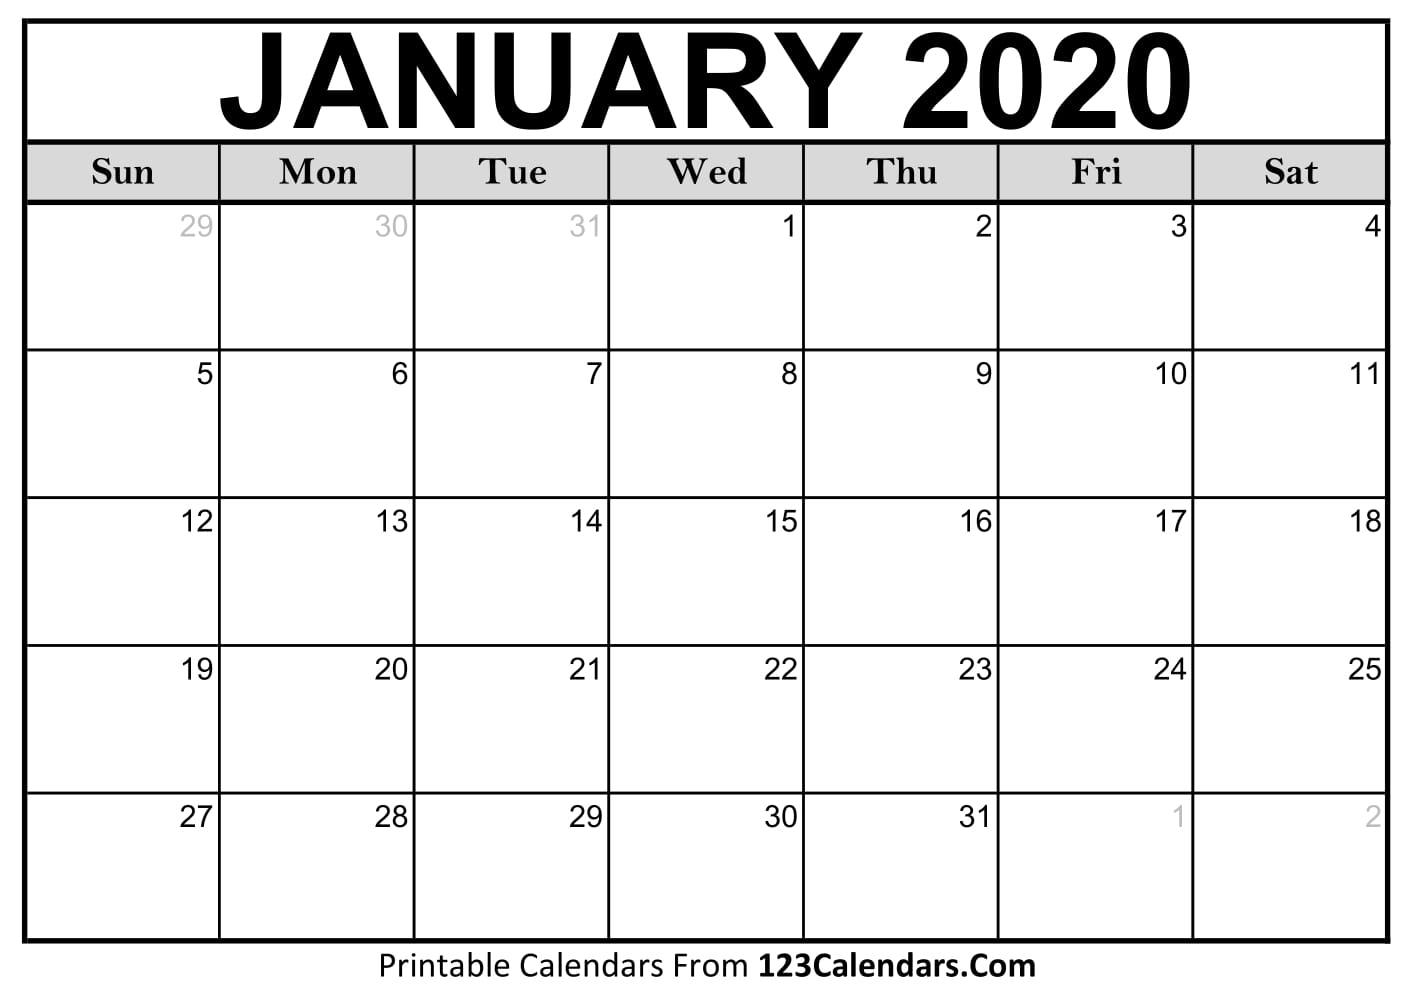 2020 Free Printable Calendar Large Numbers - Calendar